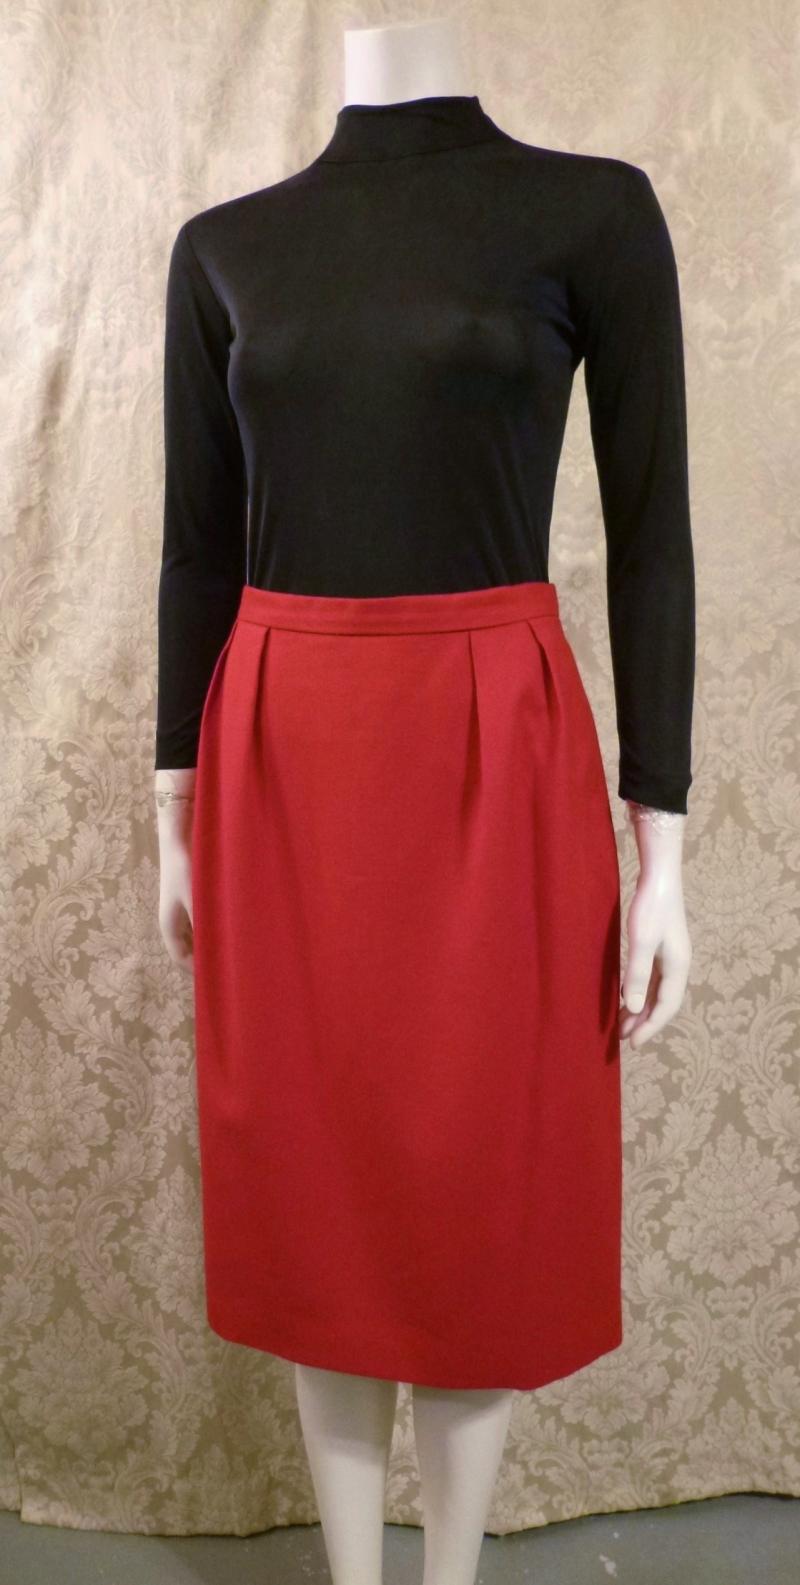 1980s vintage Christian Dior red skirt suit pockets (1)